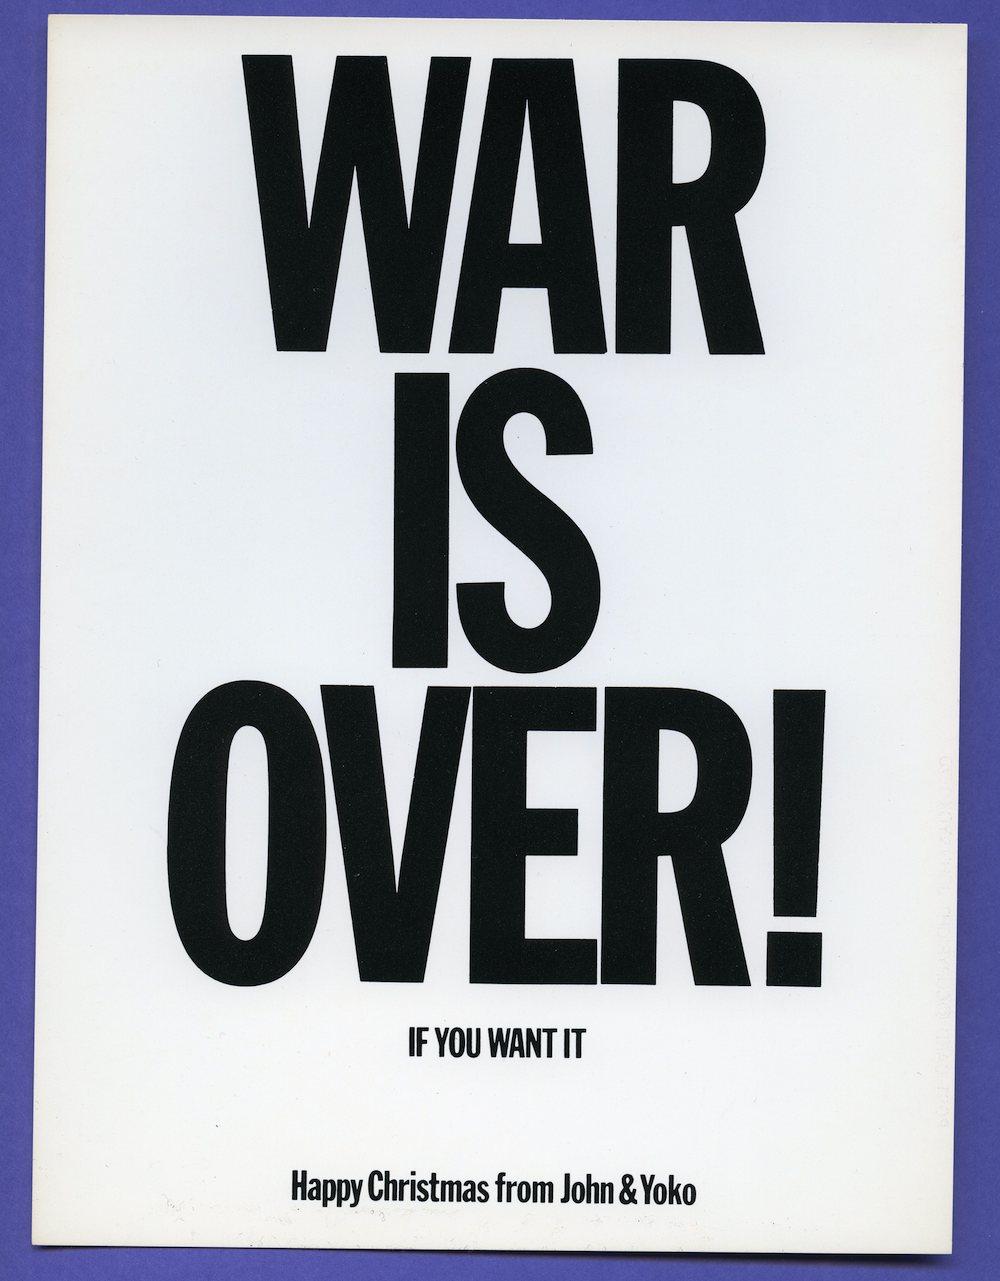 Yoko Ono, Original WAR IS OVER poster, 1969. © Yoko Ono.